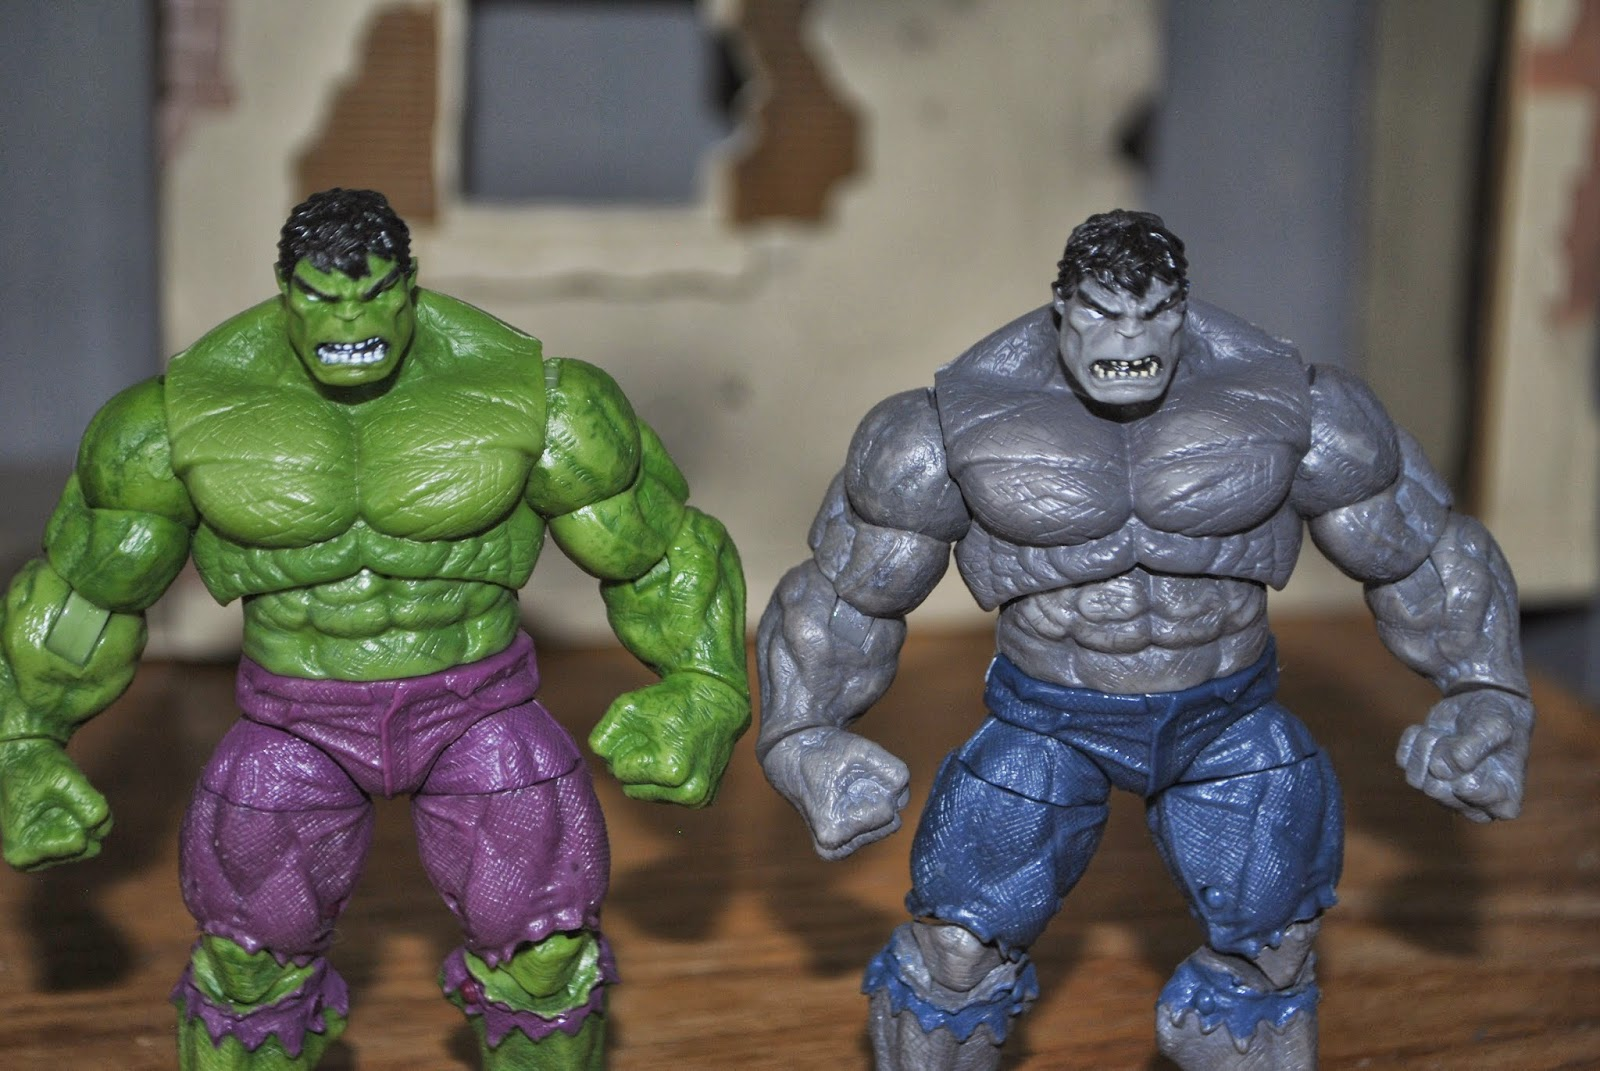 The Mojoverse: Evolution of the Marvel Universe Hulk Figure